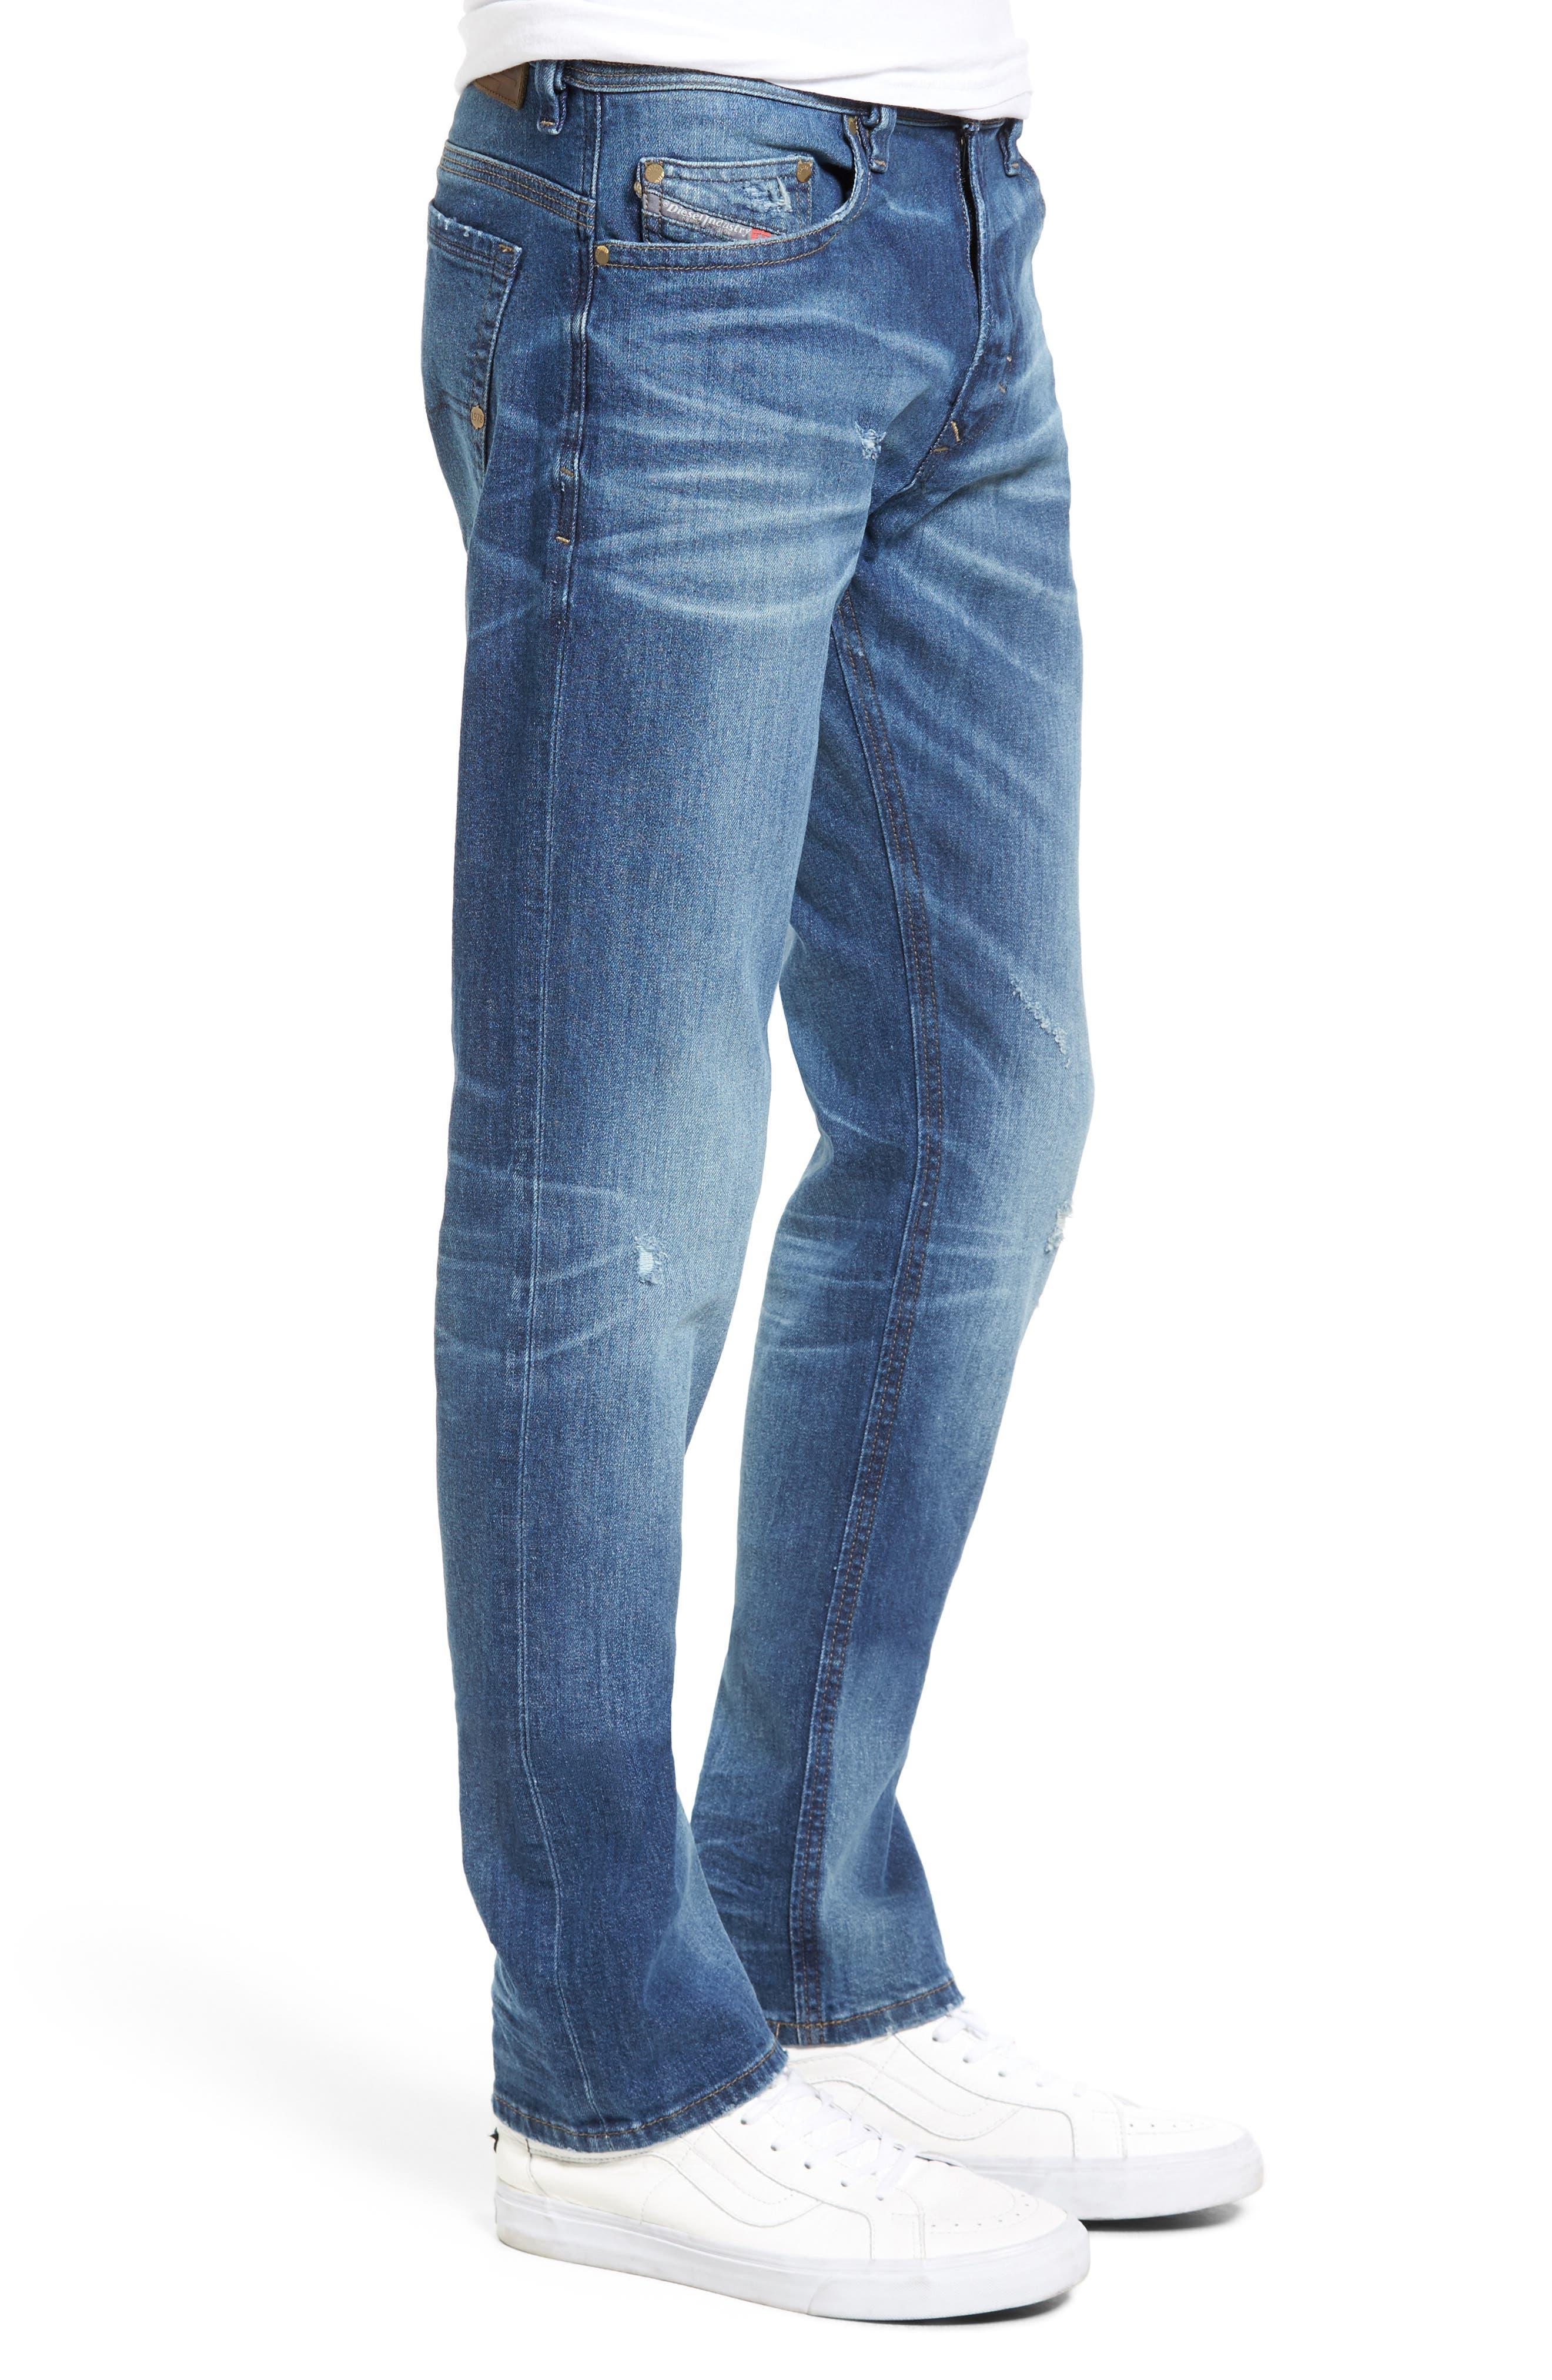 Thavar Skinny Fit Jeans,                             Alternate thumbnail 3, color,                             400